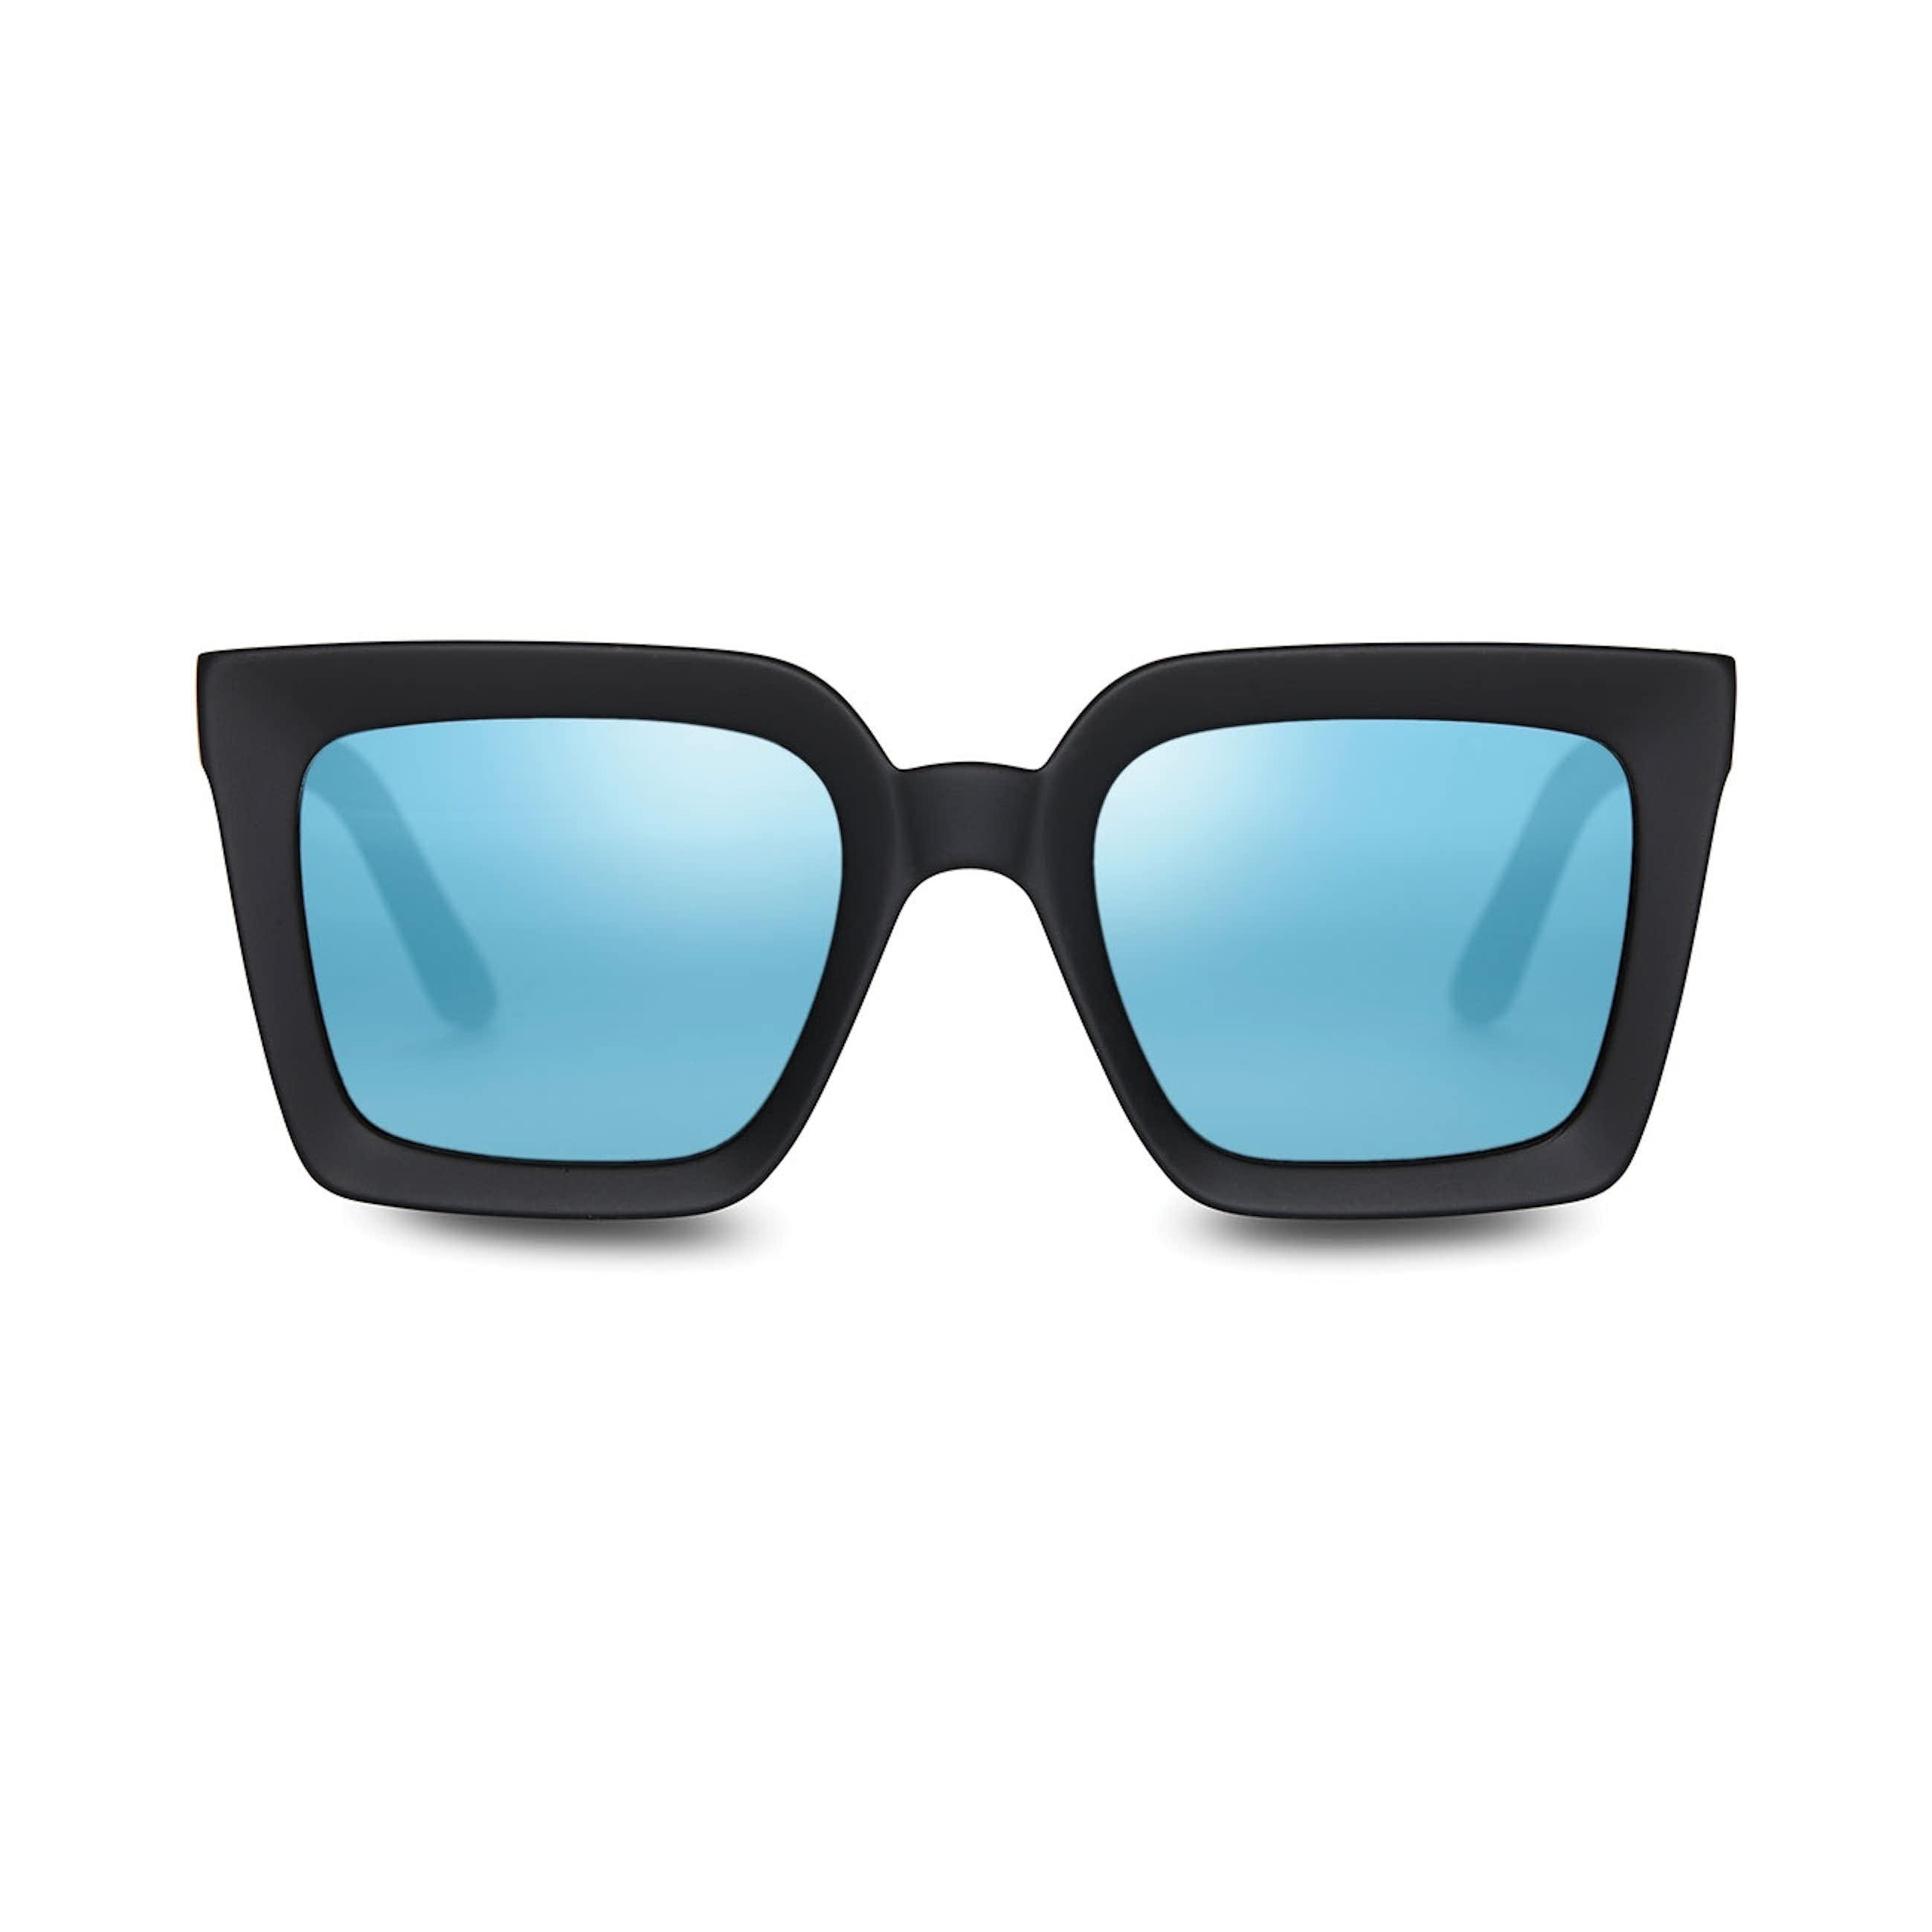 9687e17788c7 Womens Sunglasses & Snow Goggles | Ladies Sunglasses | NZ